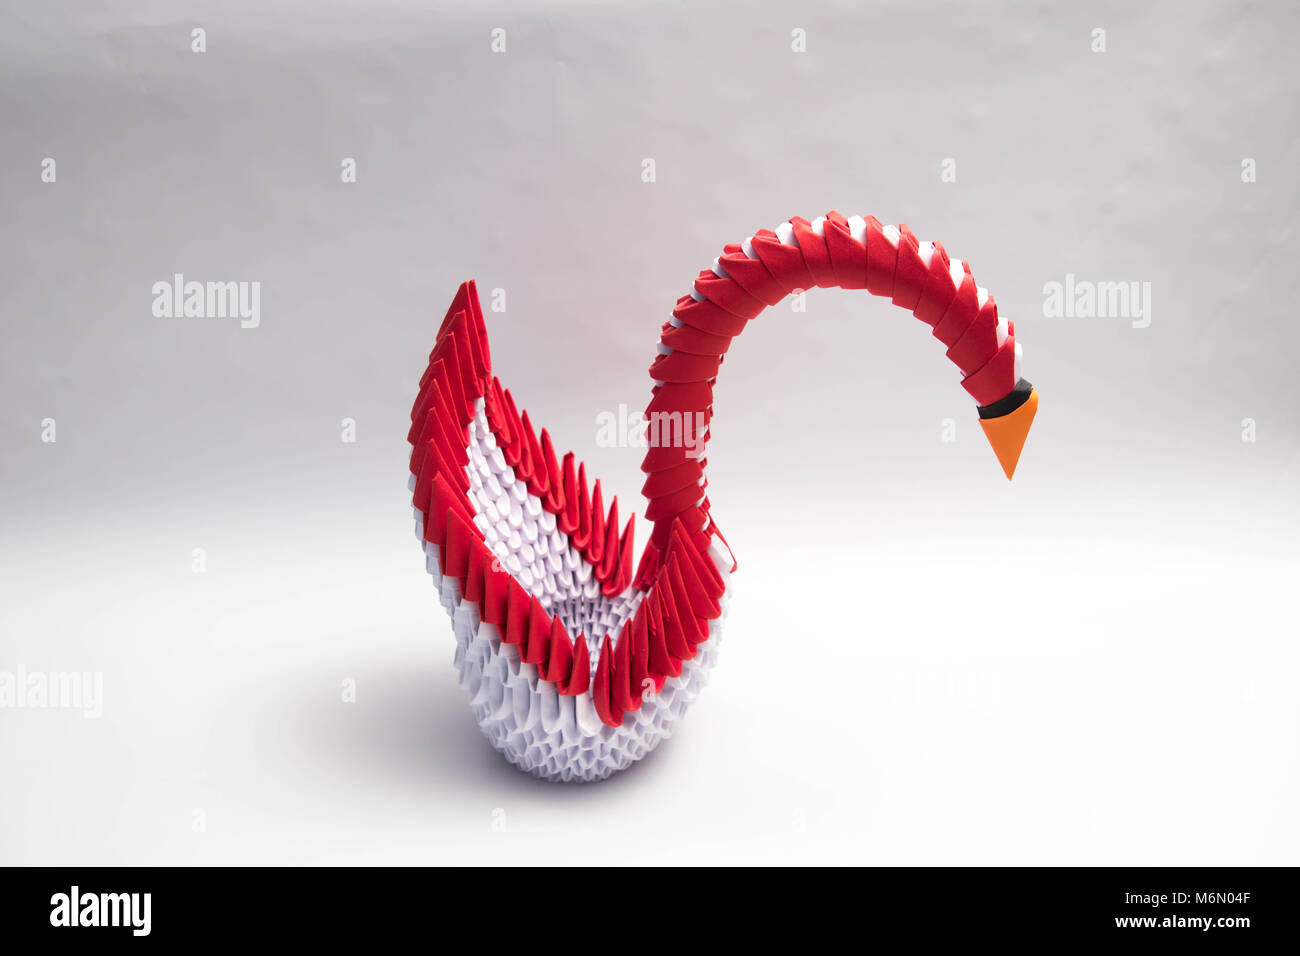 2 3d origami swans | Samsung digimax 360 | Jewellia | Flickr | 956x1300